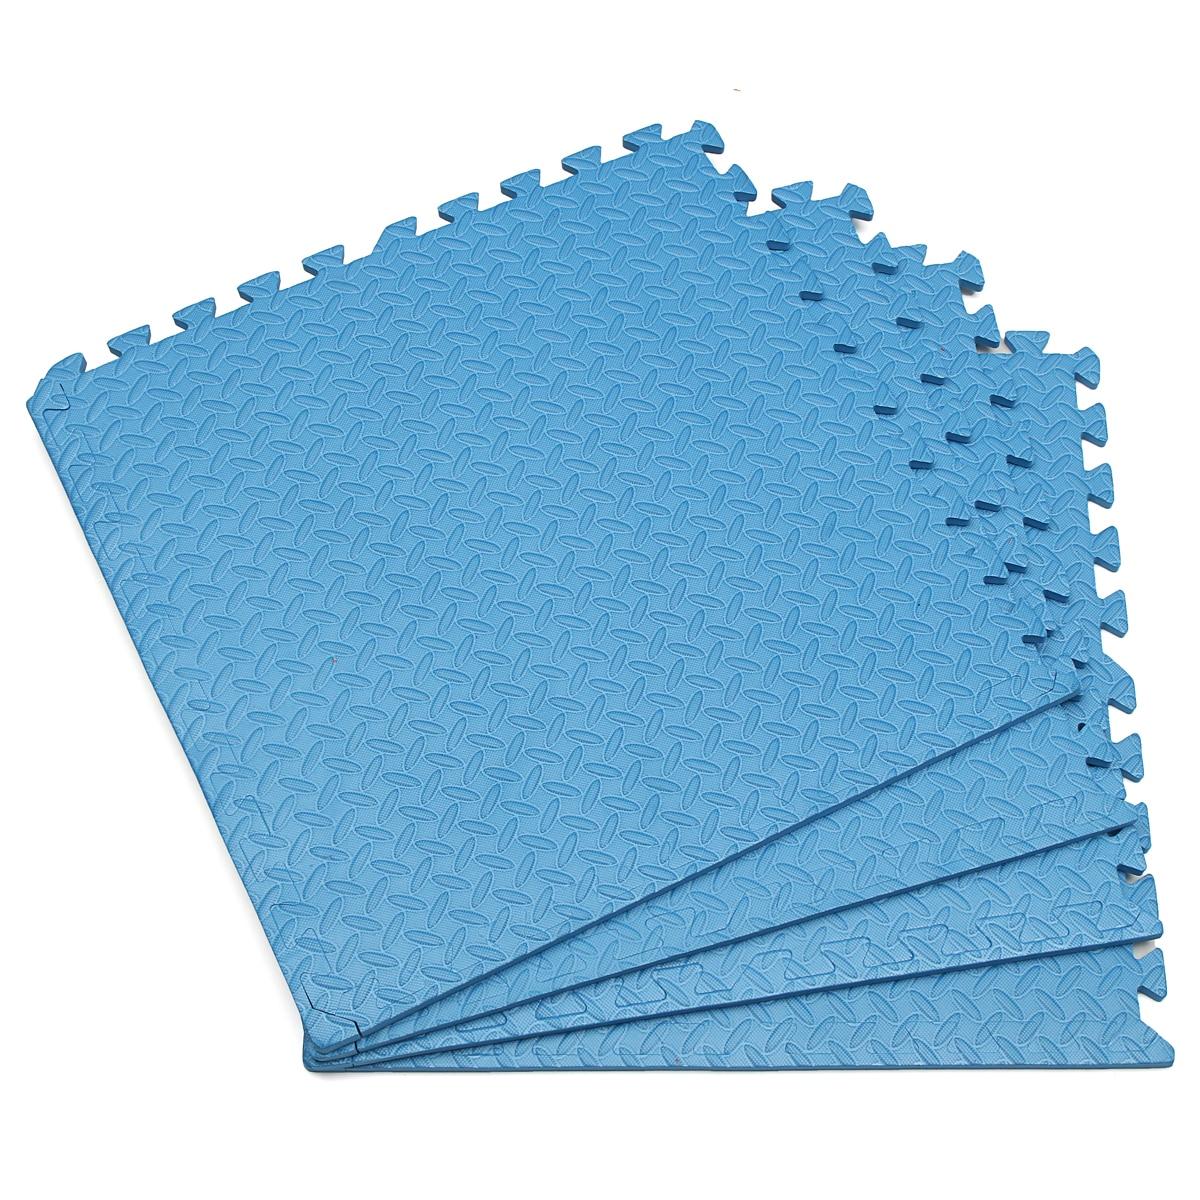 23.6x23.6x0.47 Inch Baby EVA Foam Play Puzzle Mat Interlocking Exercise Tiles Floor Carpet Rug for Kid